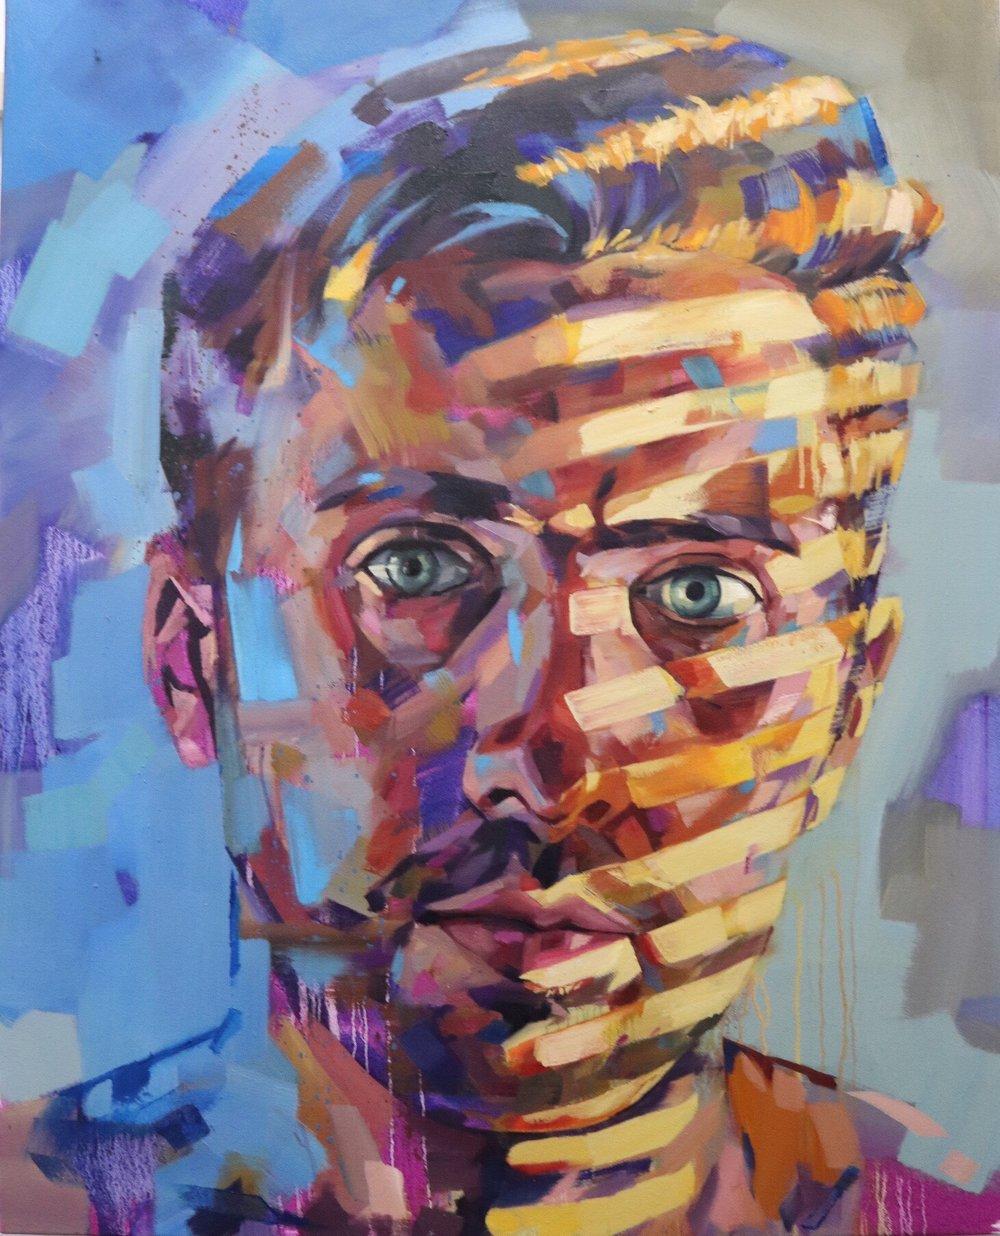 Hollow Stare,2018. 0il on canvas. 80 x 100 cm.jpeg